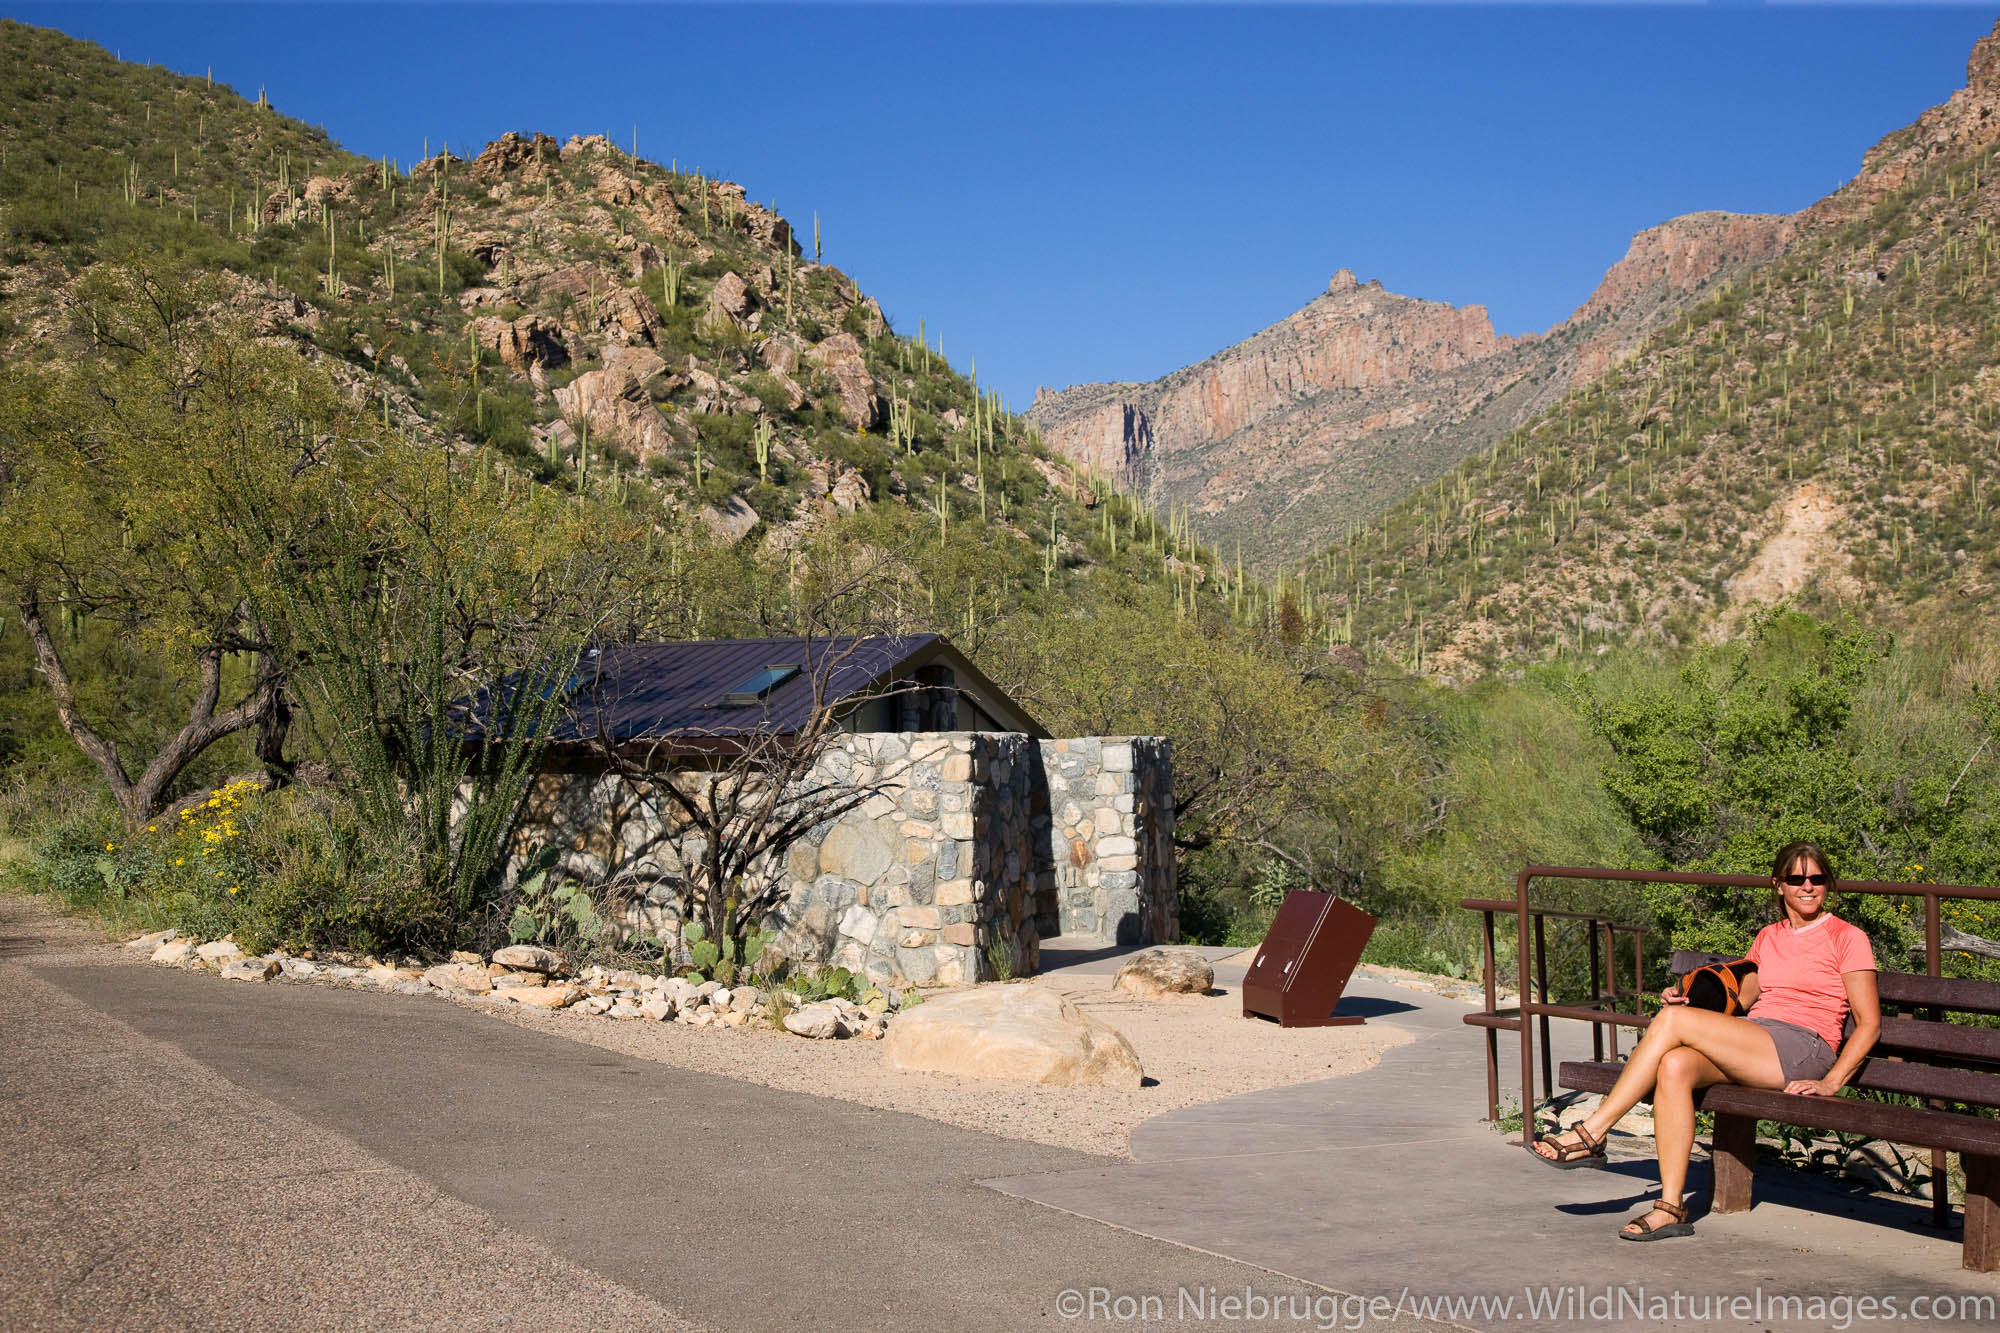 Hiker waits at Shuttle Bus stop #1, Sabino Canyon Recreation Area, Tucson, Arizona.  (model released)